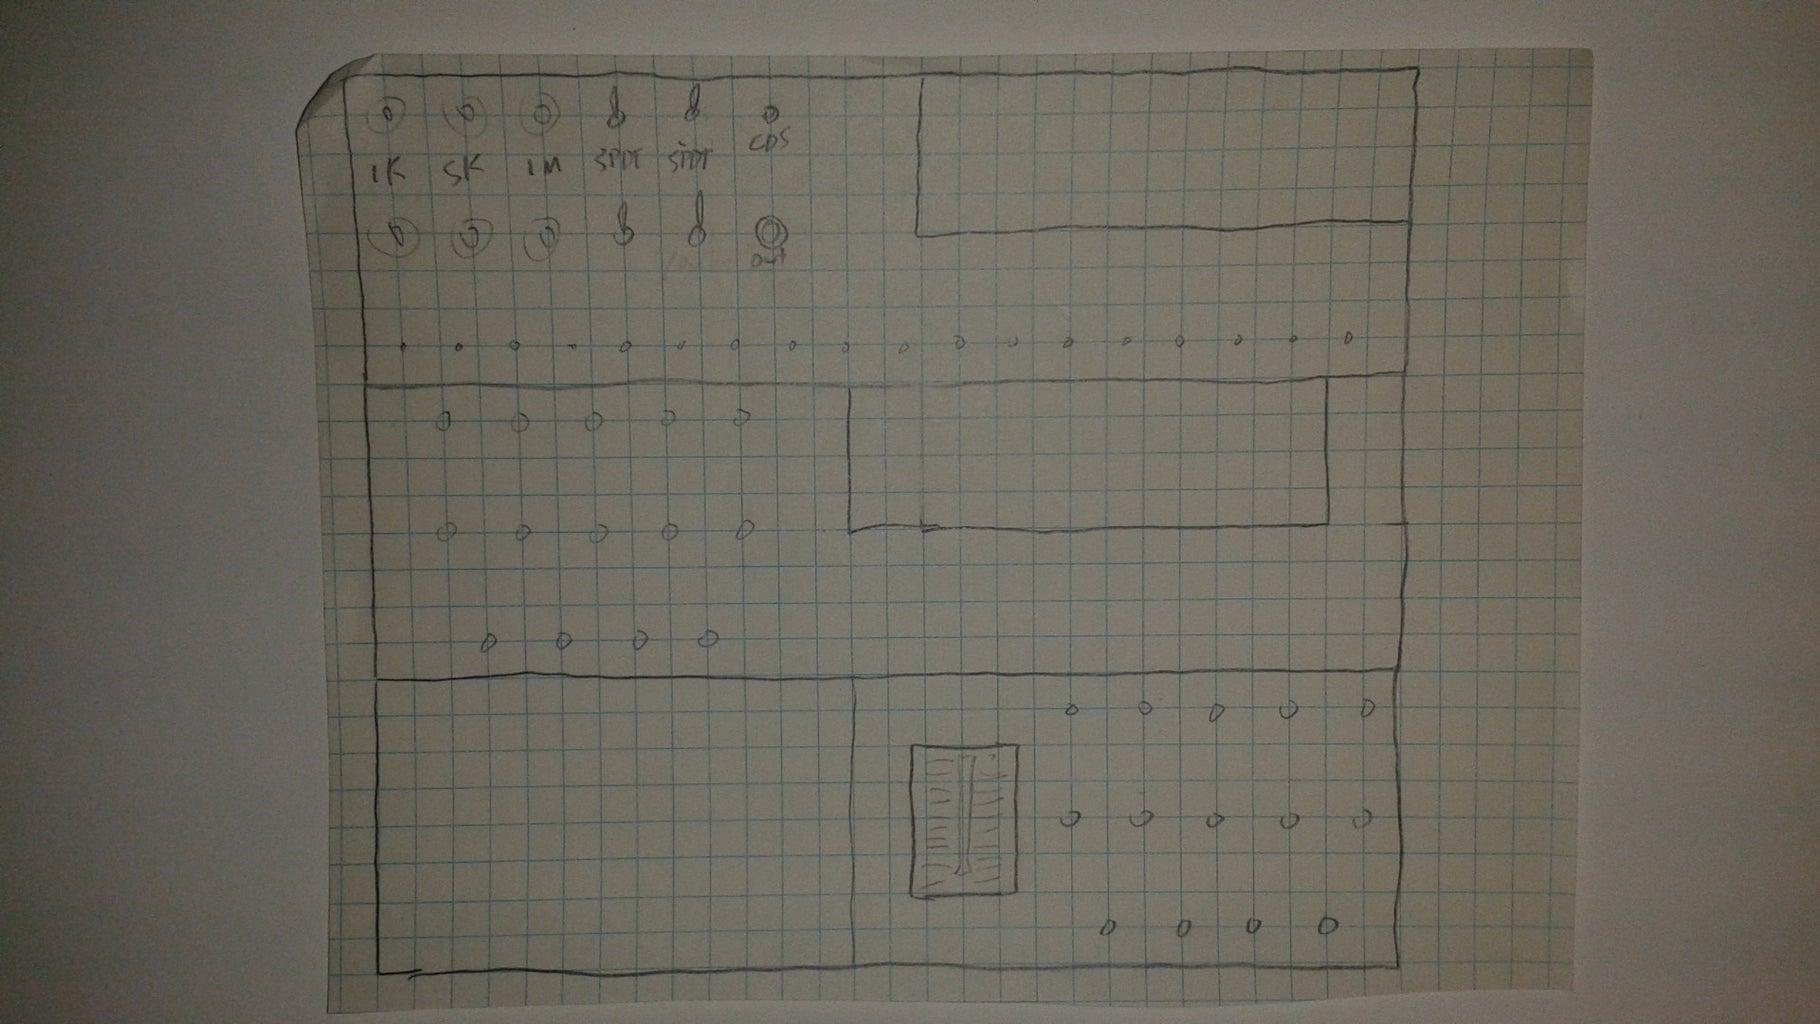 Designing the Prototype Module